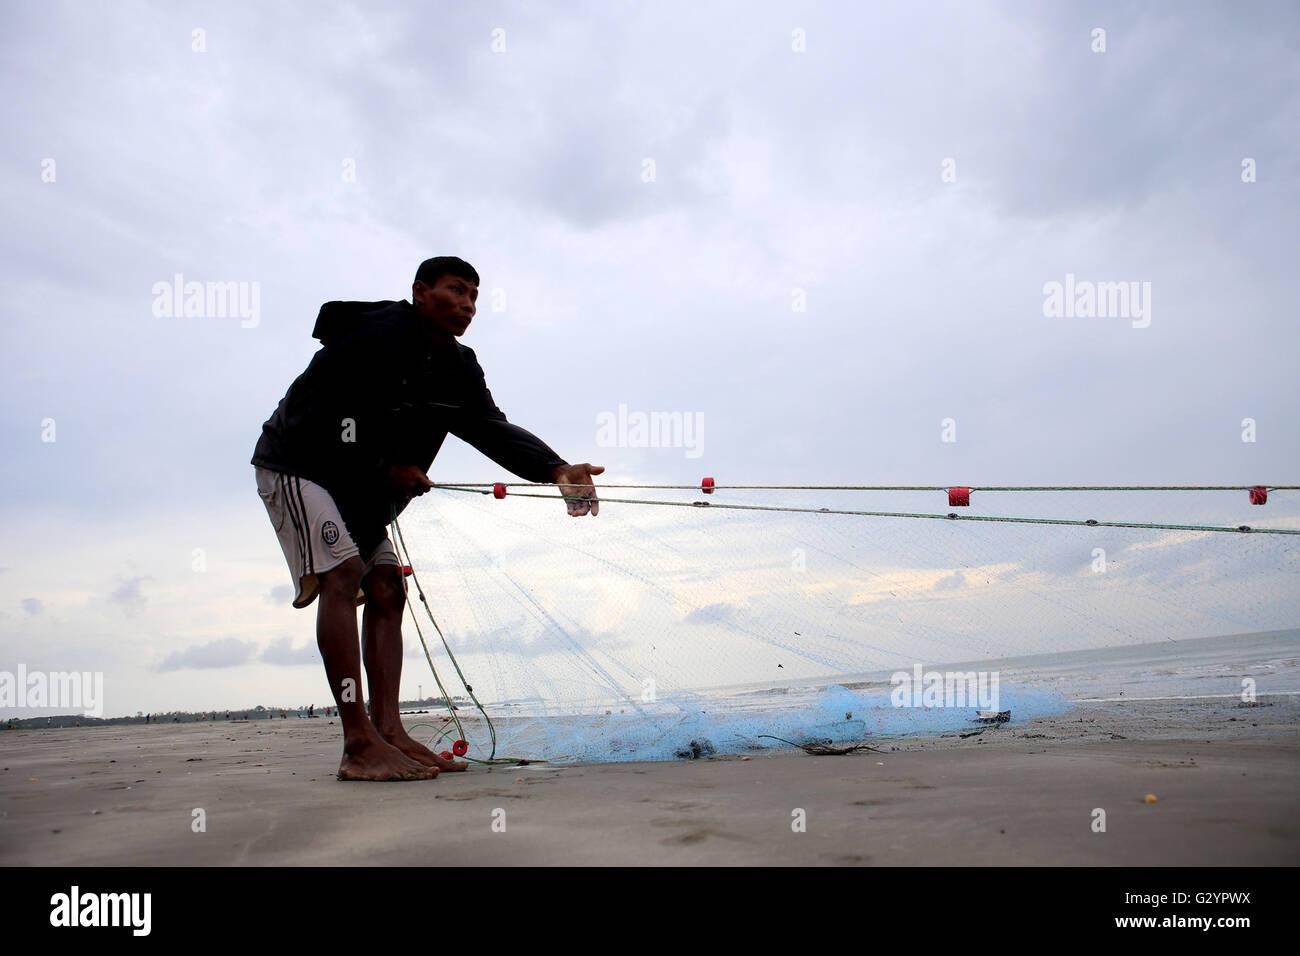 Kyaukphyu, Myanmar. 5th June, 2016. A fisherman pulls fishing net at the Kyaukphyu beach in Rakhine State, western - Stock Image